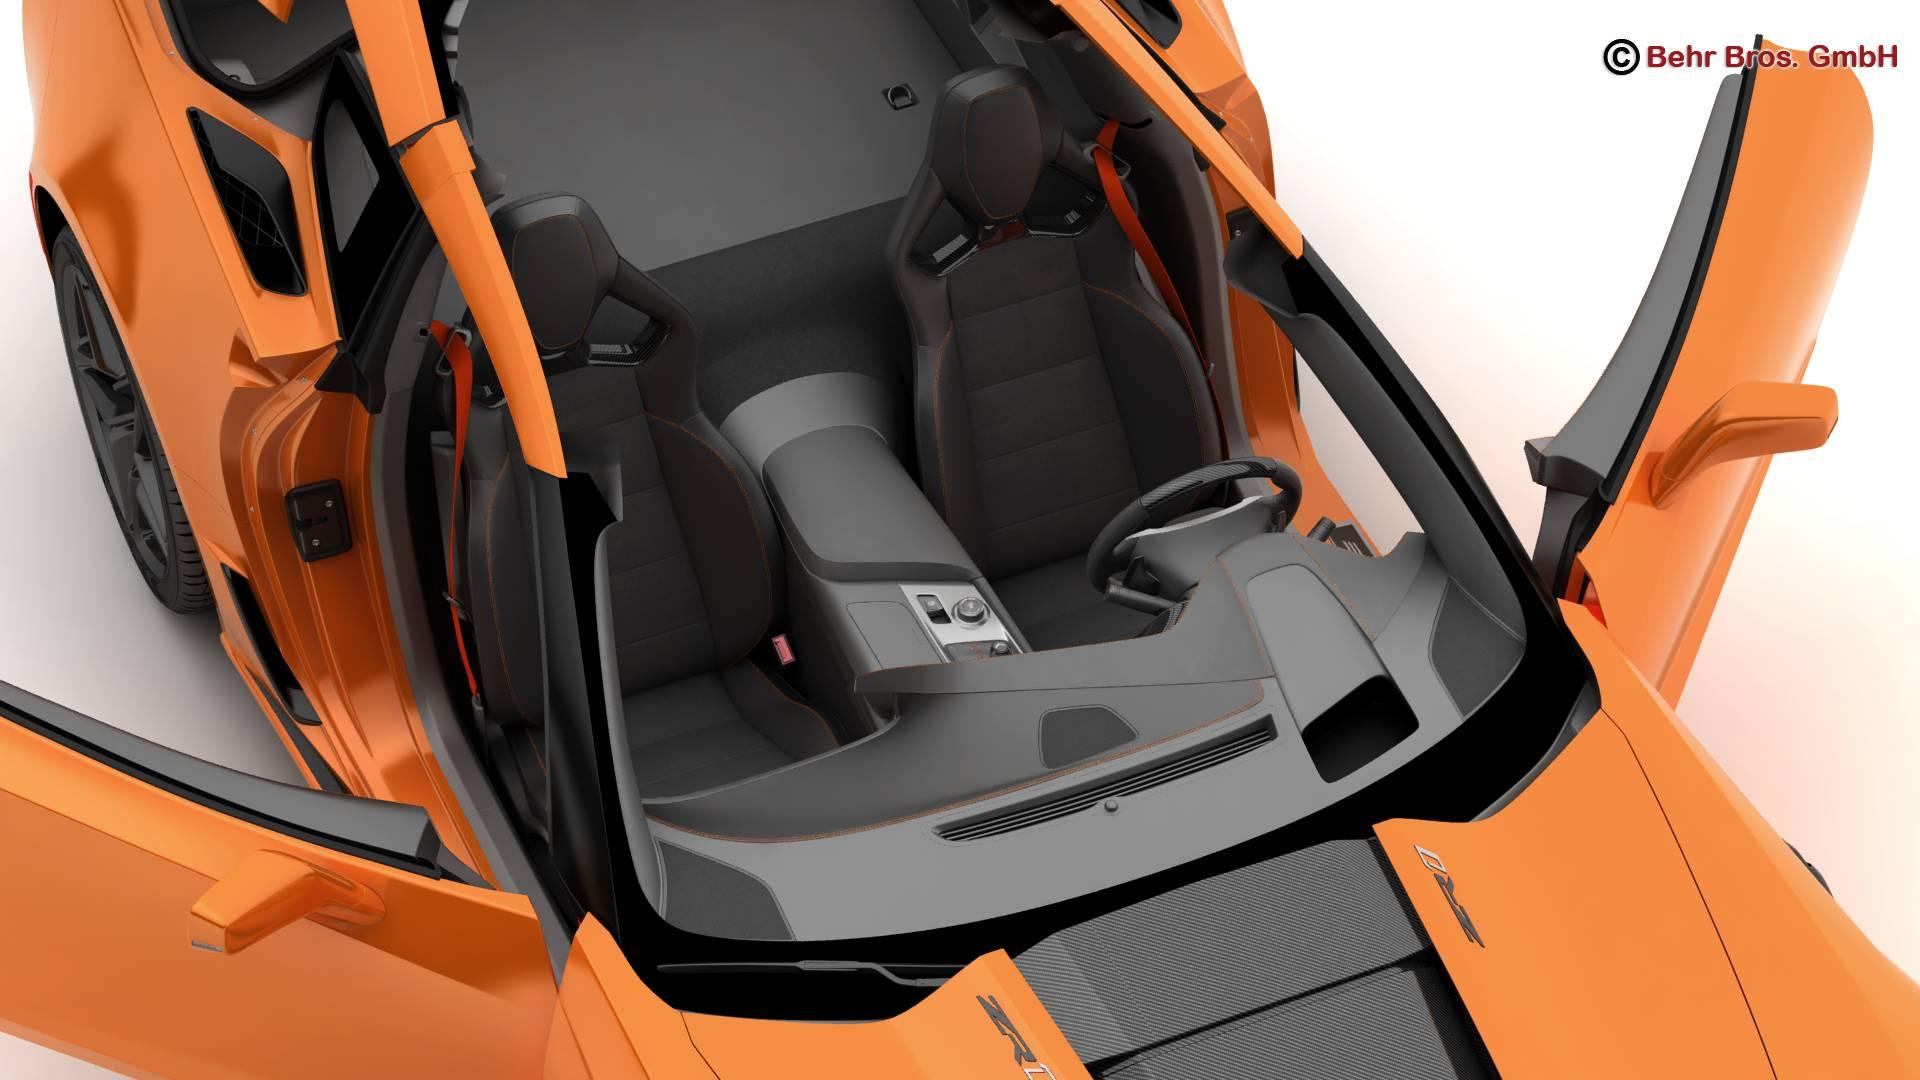 chevrolet corvette zr1 2019 3d model 3ds max fbx c4d lwo ma mb obj 275977